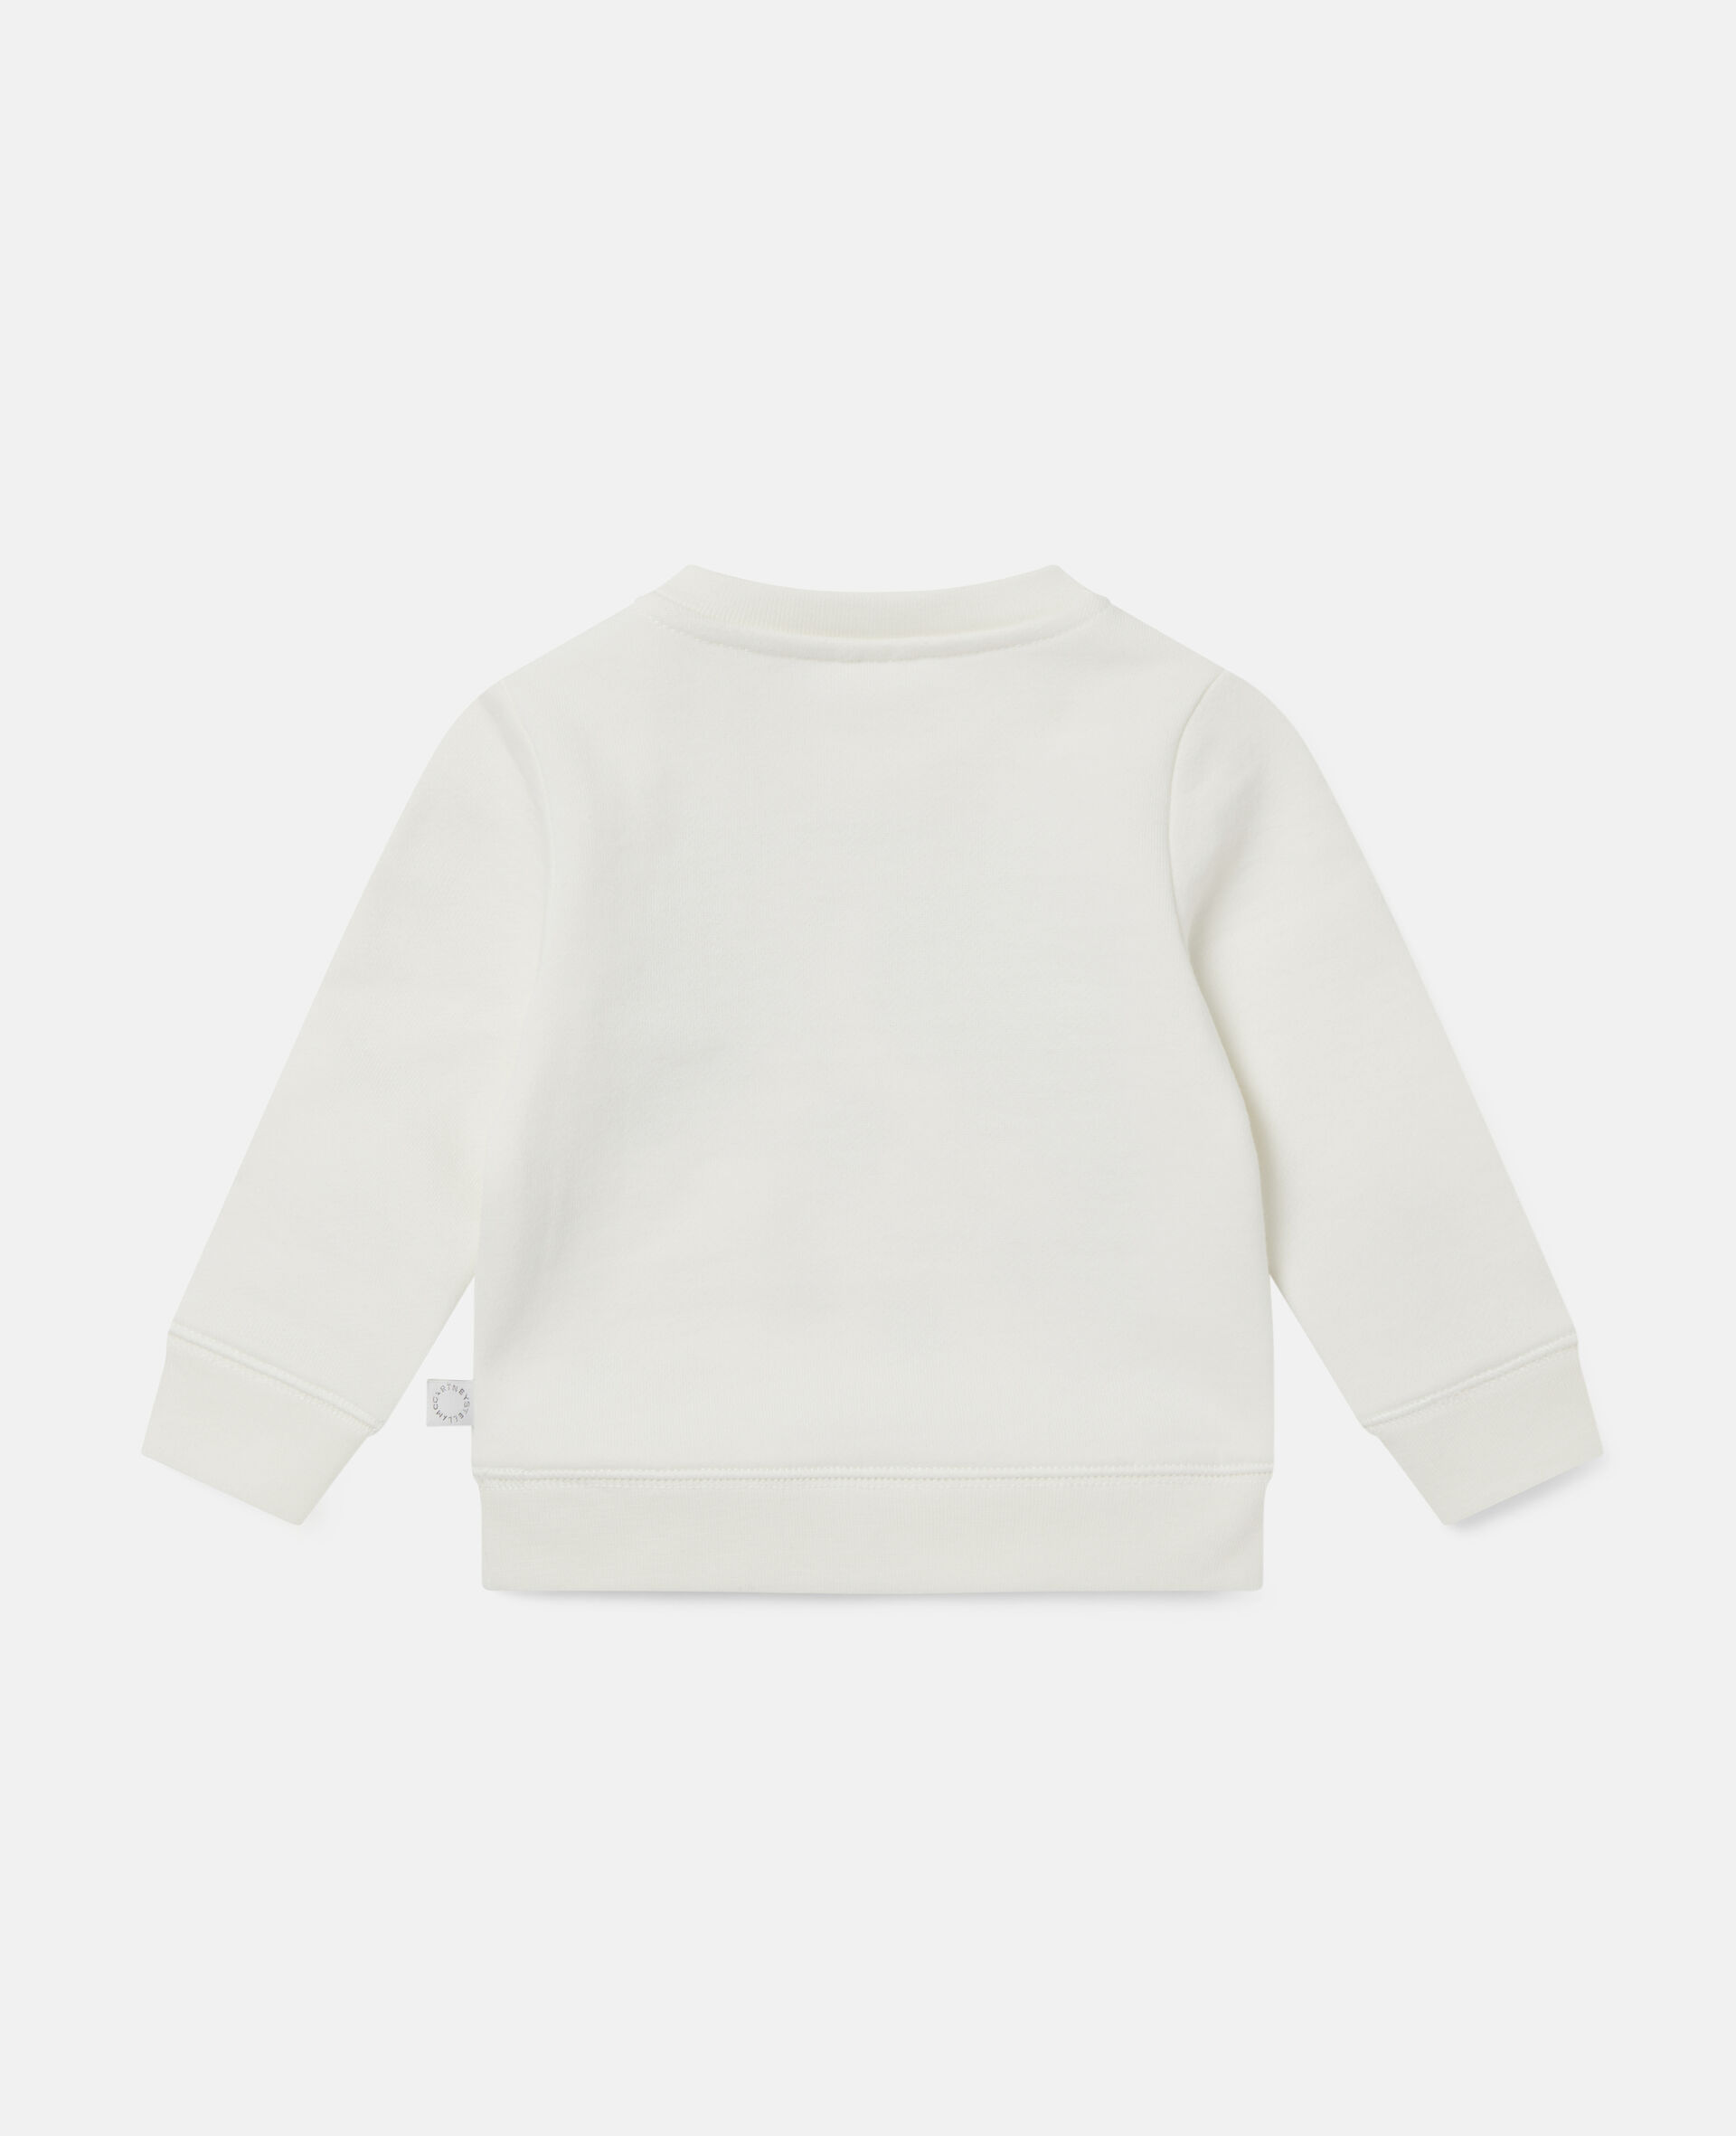 Felpa in Cotone con Dalmata-Bianco-large image number 3